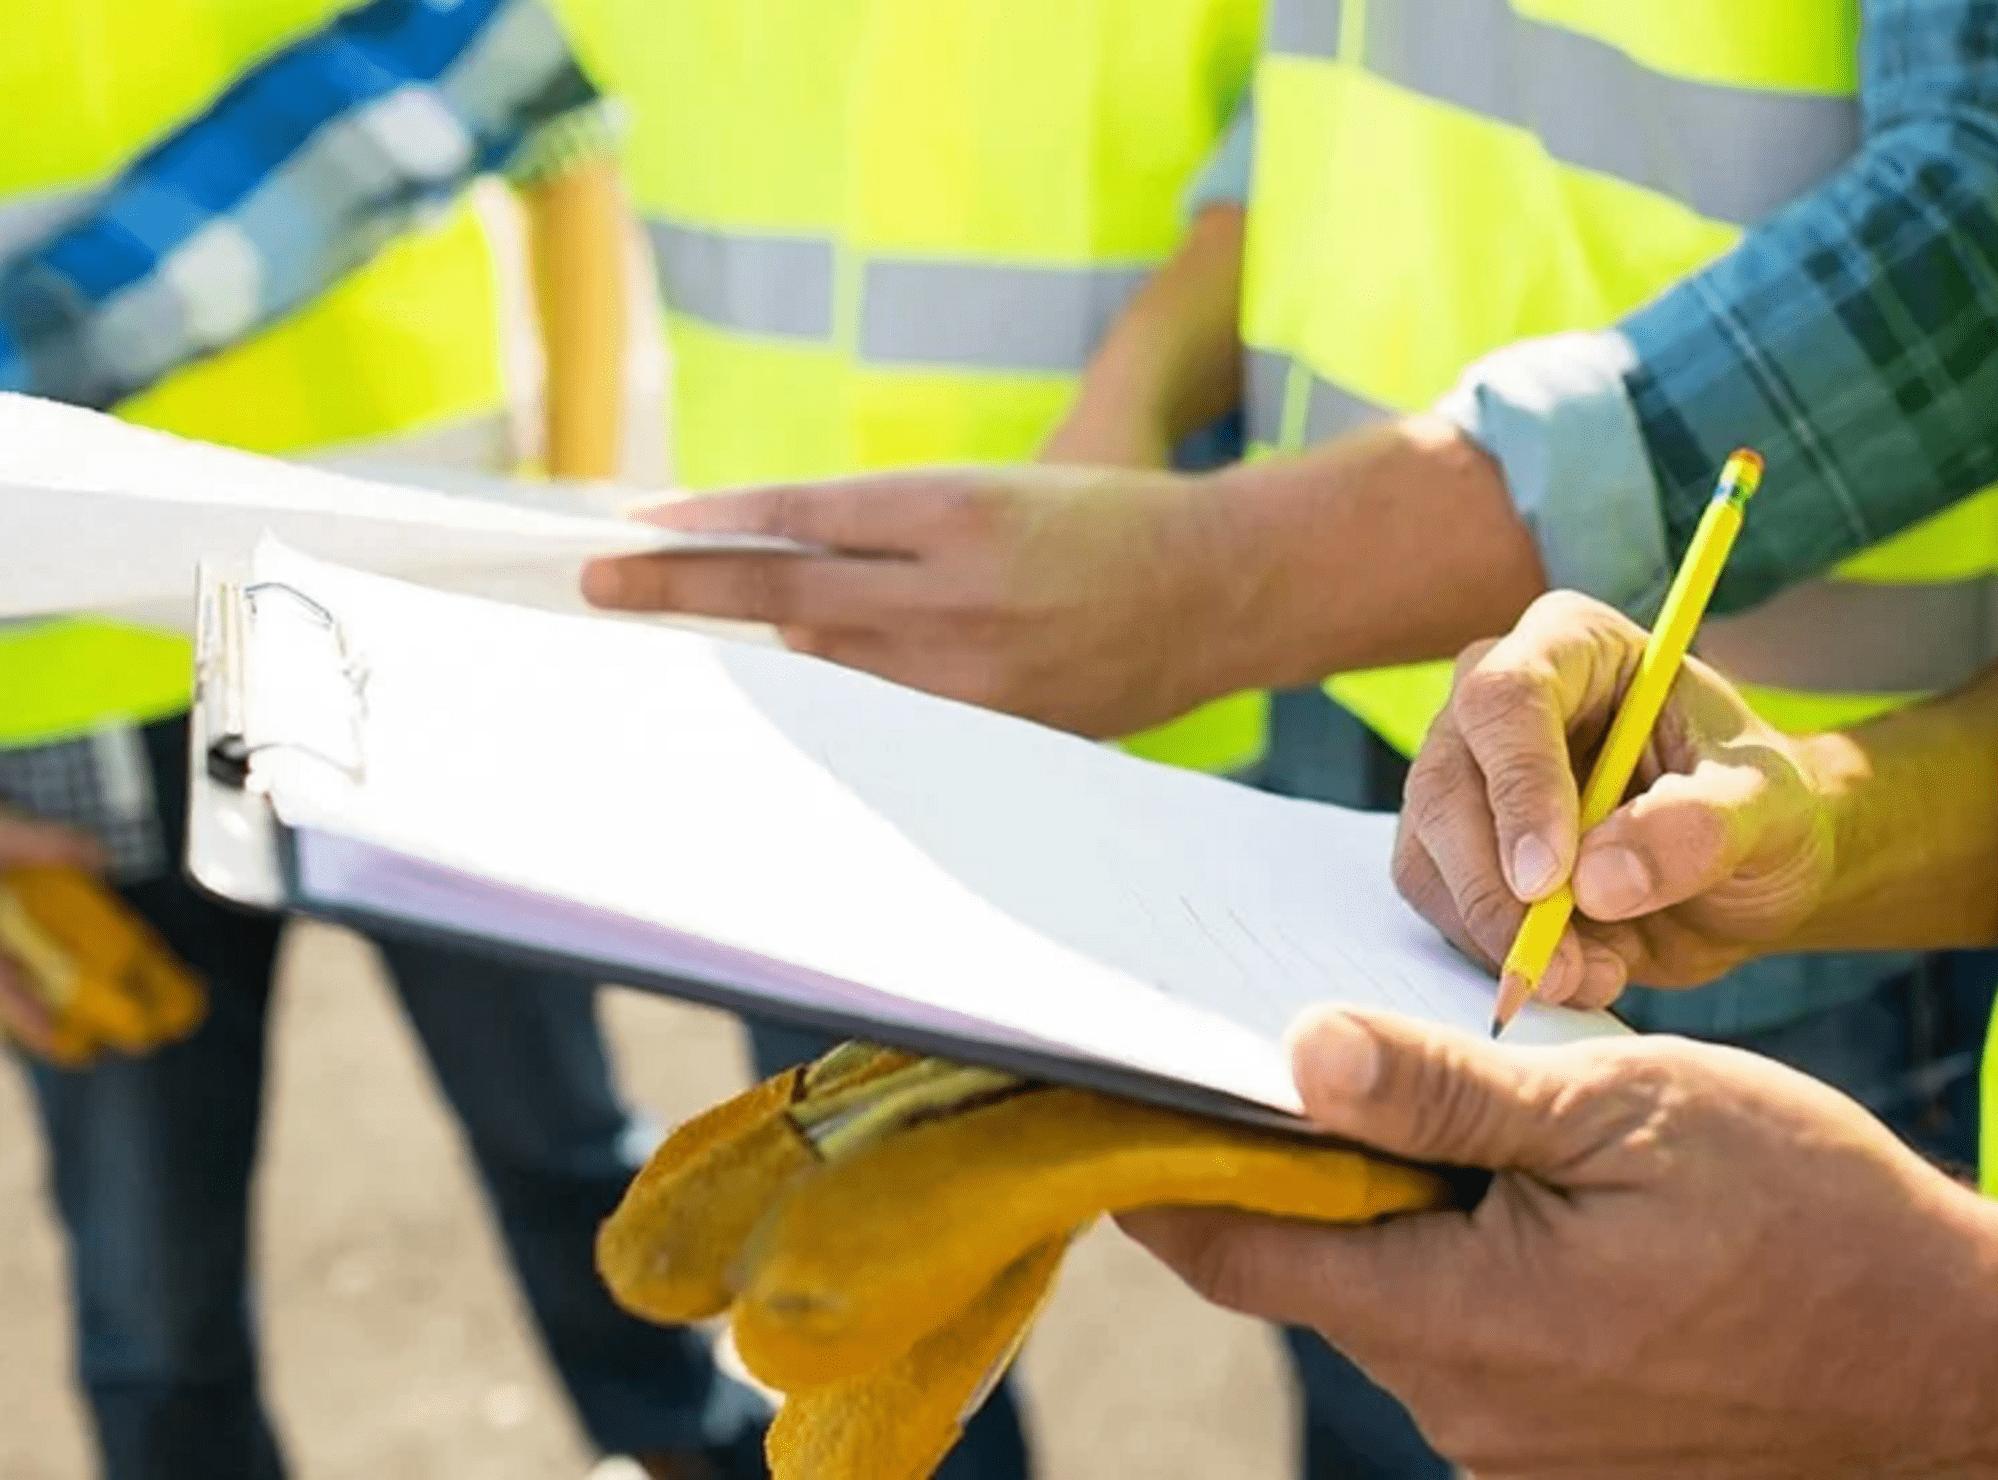 Accruent - Resources - White Papers - 6 Strategies to Establish a World-Class Preventive Maintenance Program - Hero